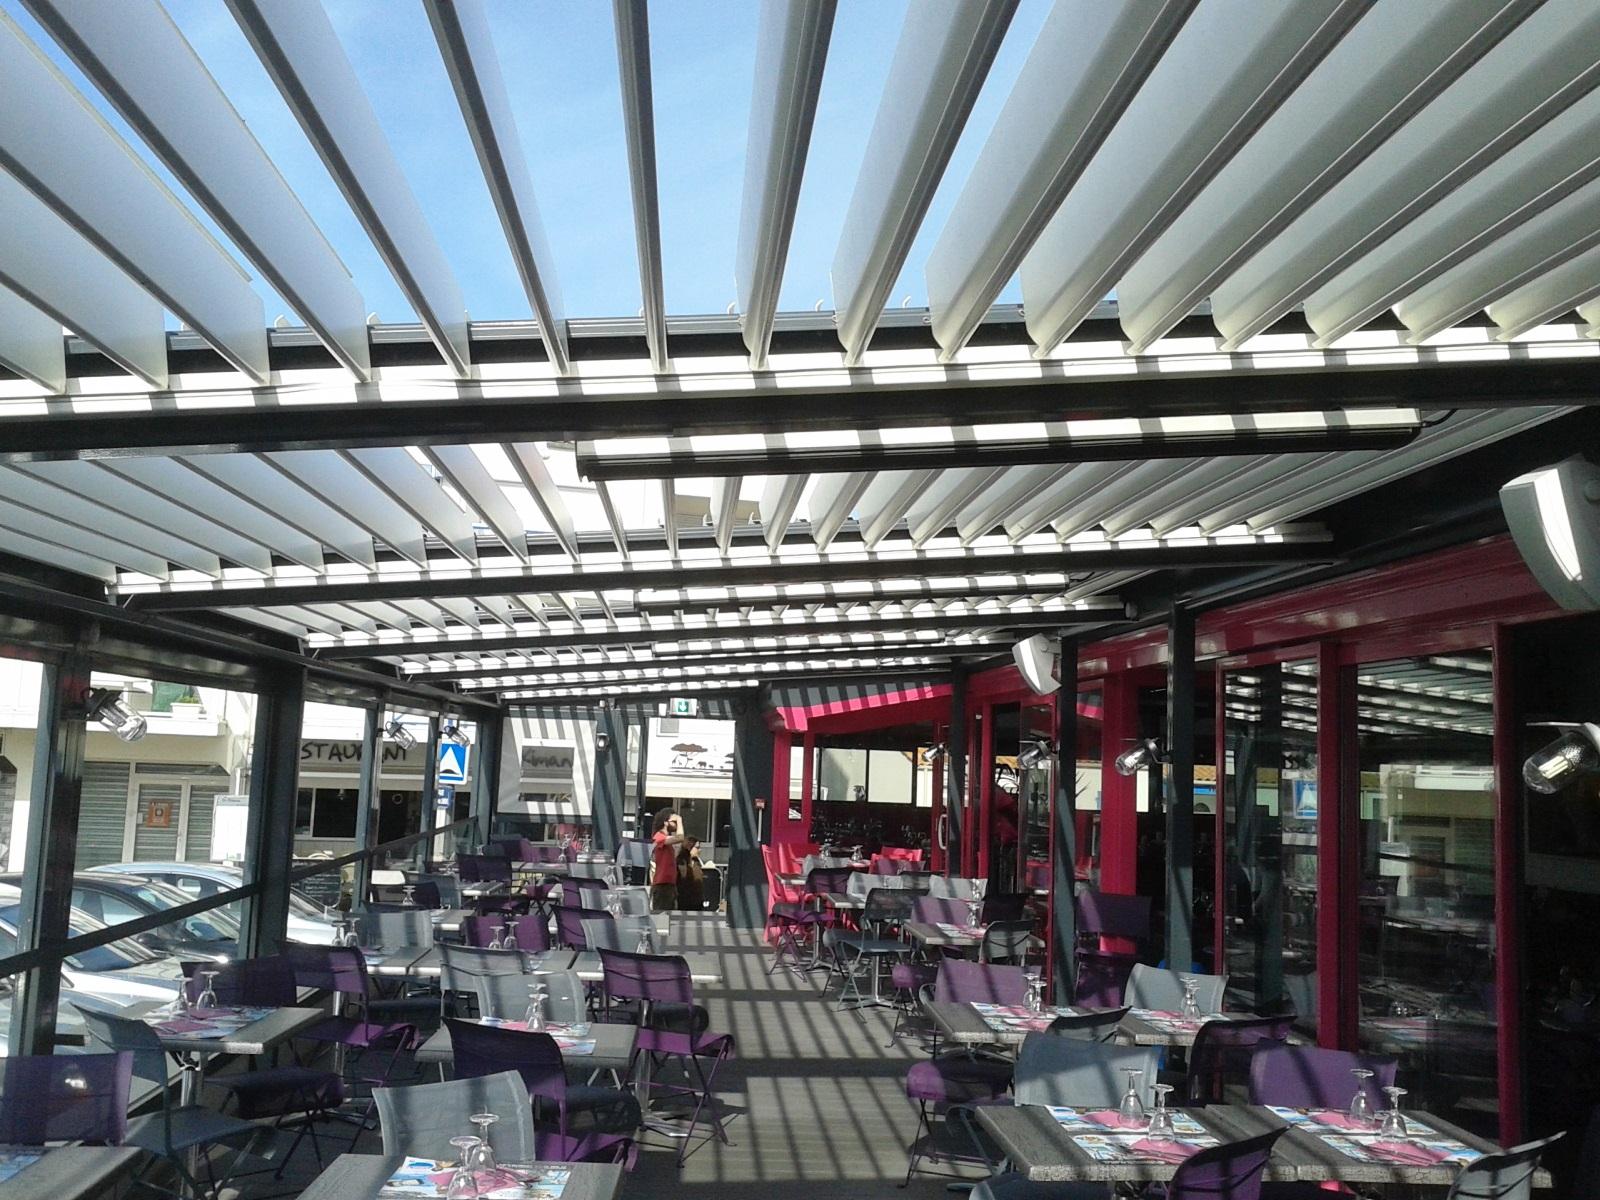 Infrarouge sans lumi re r f mhs z ro sous une pergola for Jard sur mer restaurant